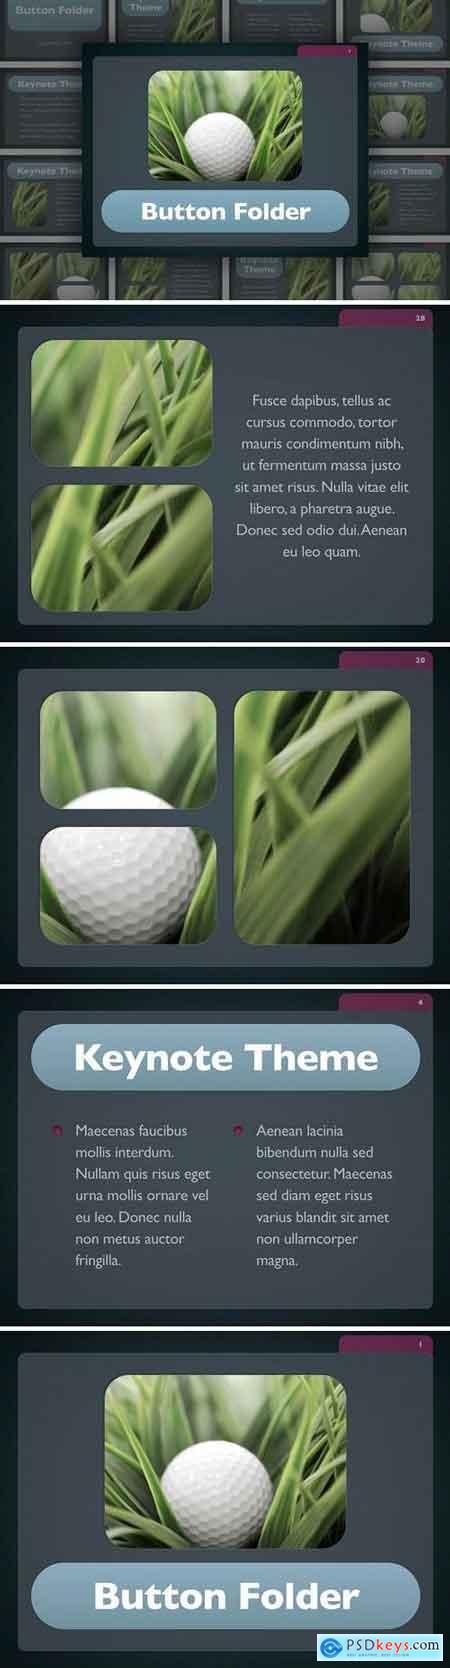 Button Folder Keynote Template